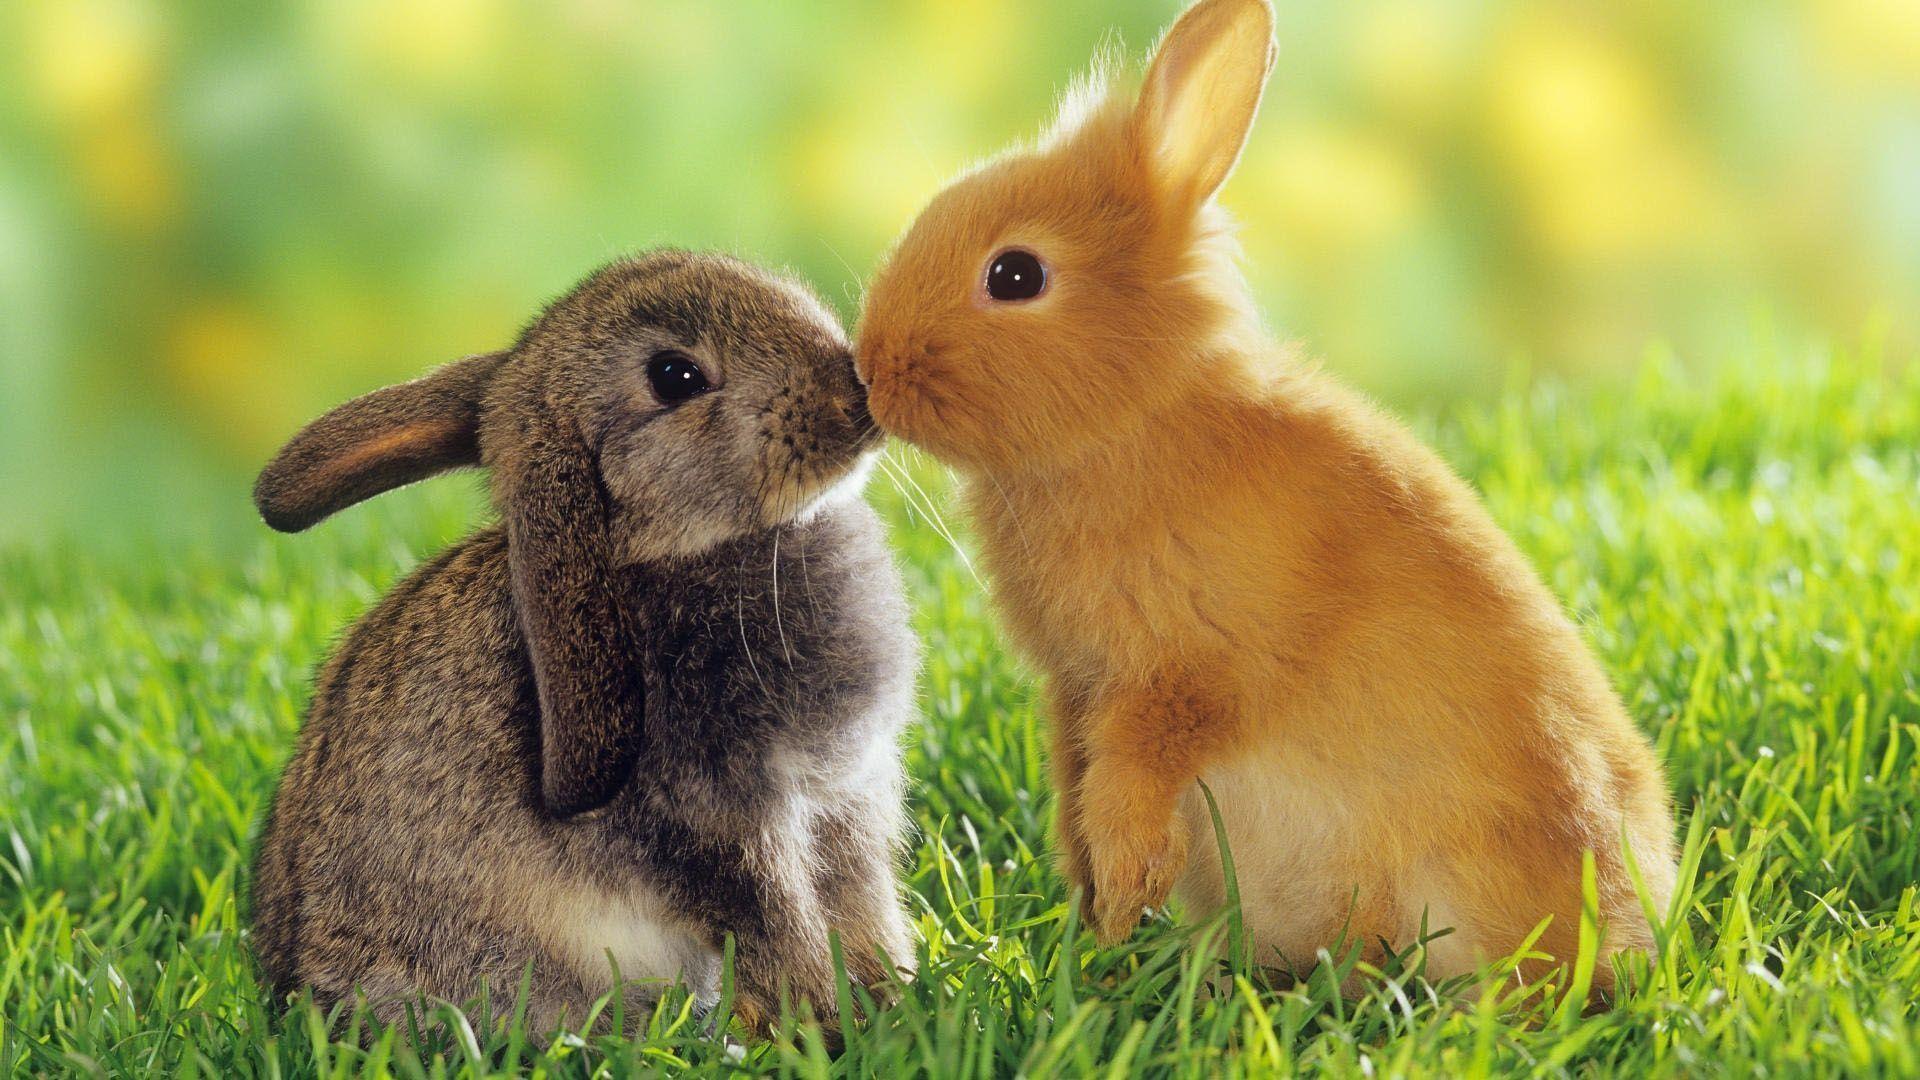 Easter Bunny Desktop Wallpaper Wallpapertag